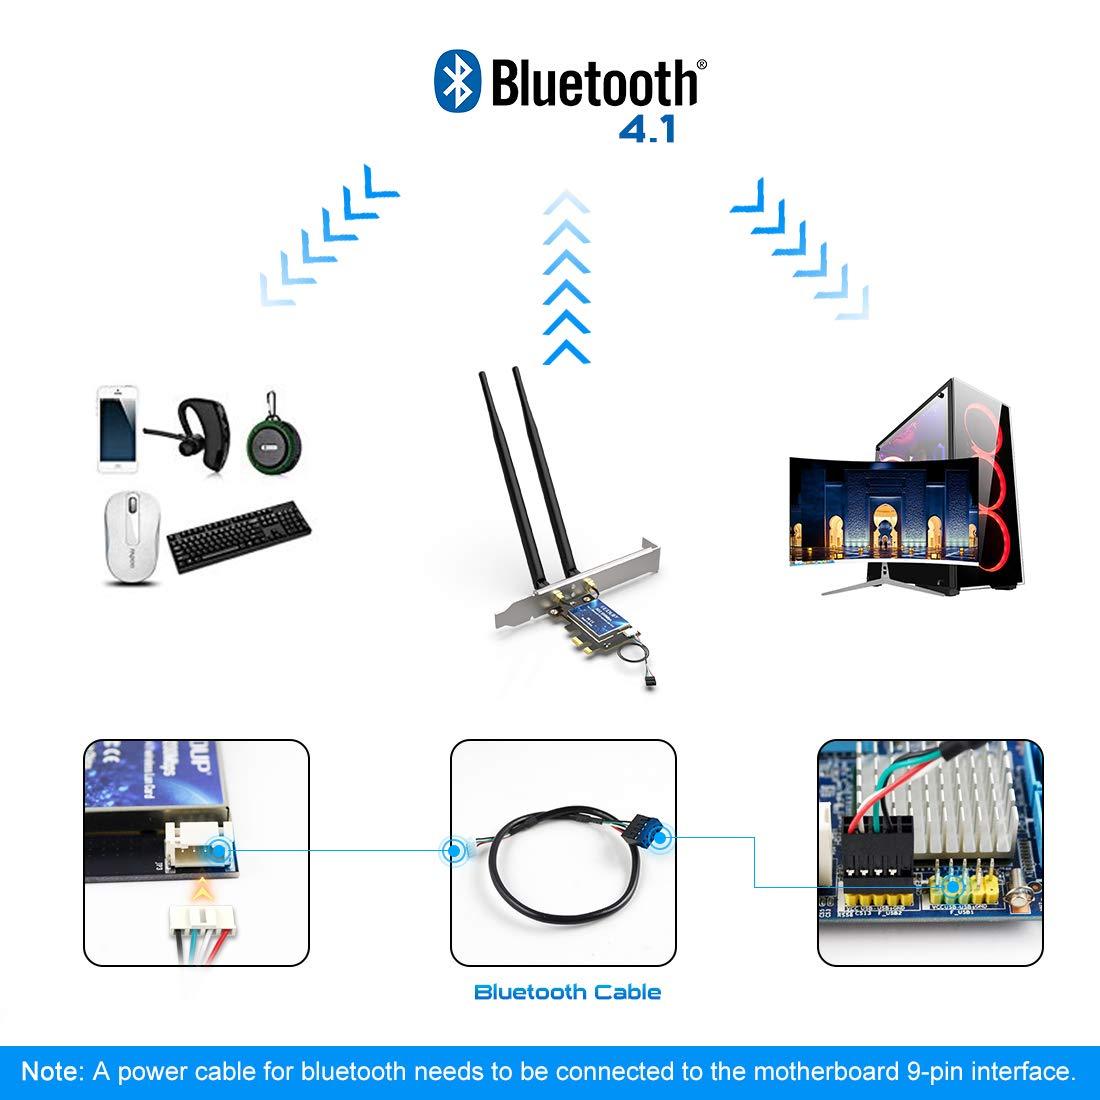 EDUP WiFi Card, PCIe Wireless Card AC1200,Bluetooth 4.1 Dual Band Wireless Network Card, PCI-E Wireless WiFi Network Adapter for Desktop PC, Suppots Windows 7/8.1/10